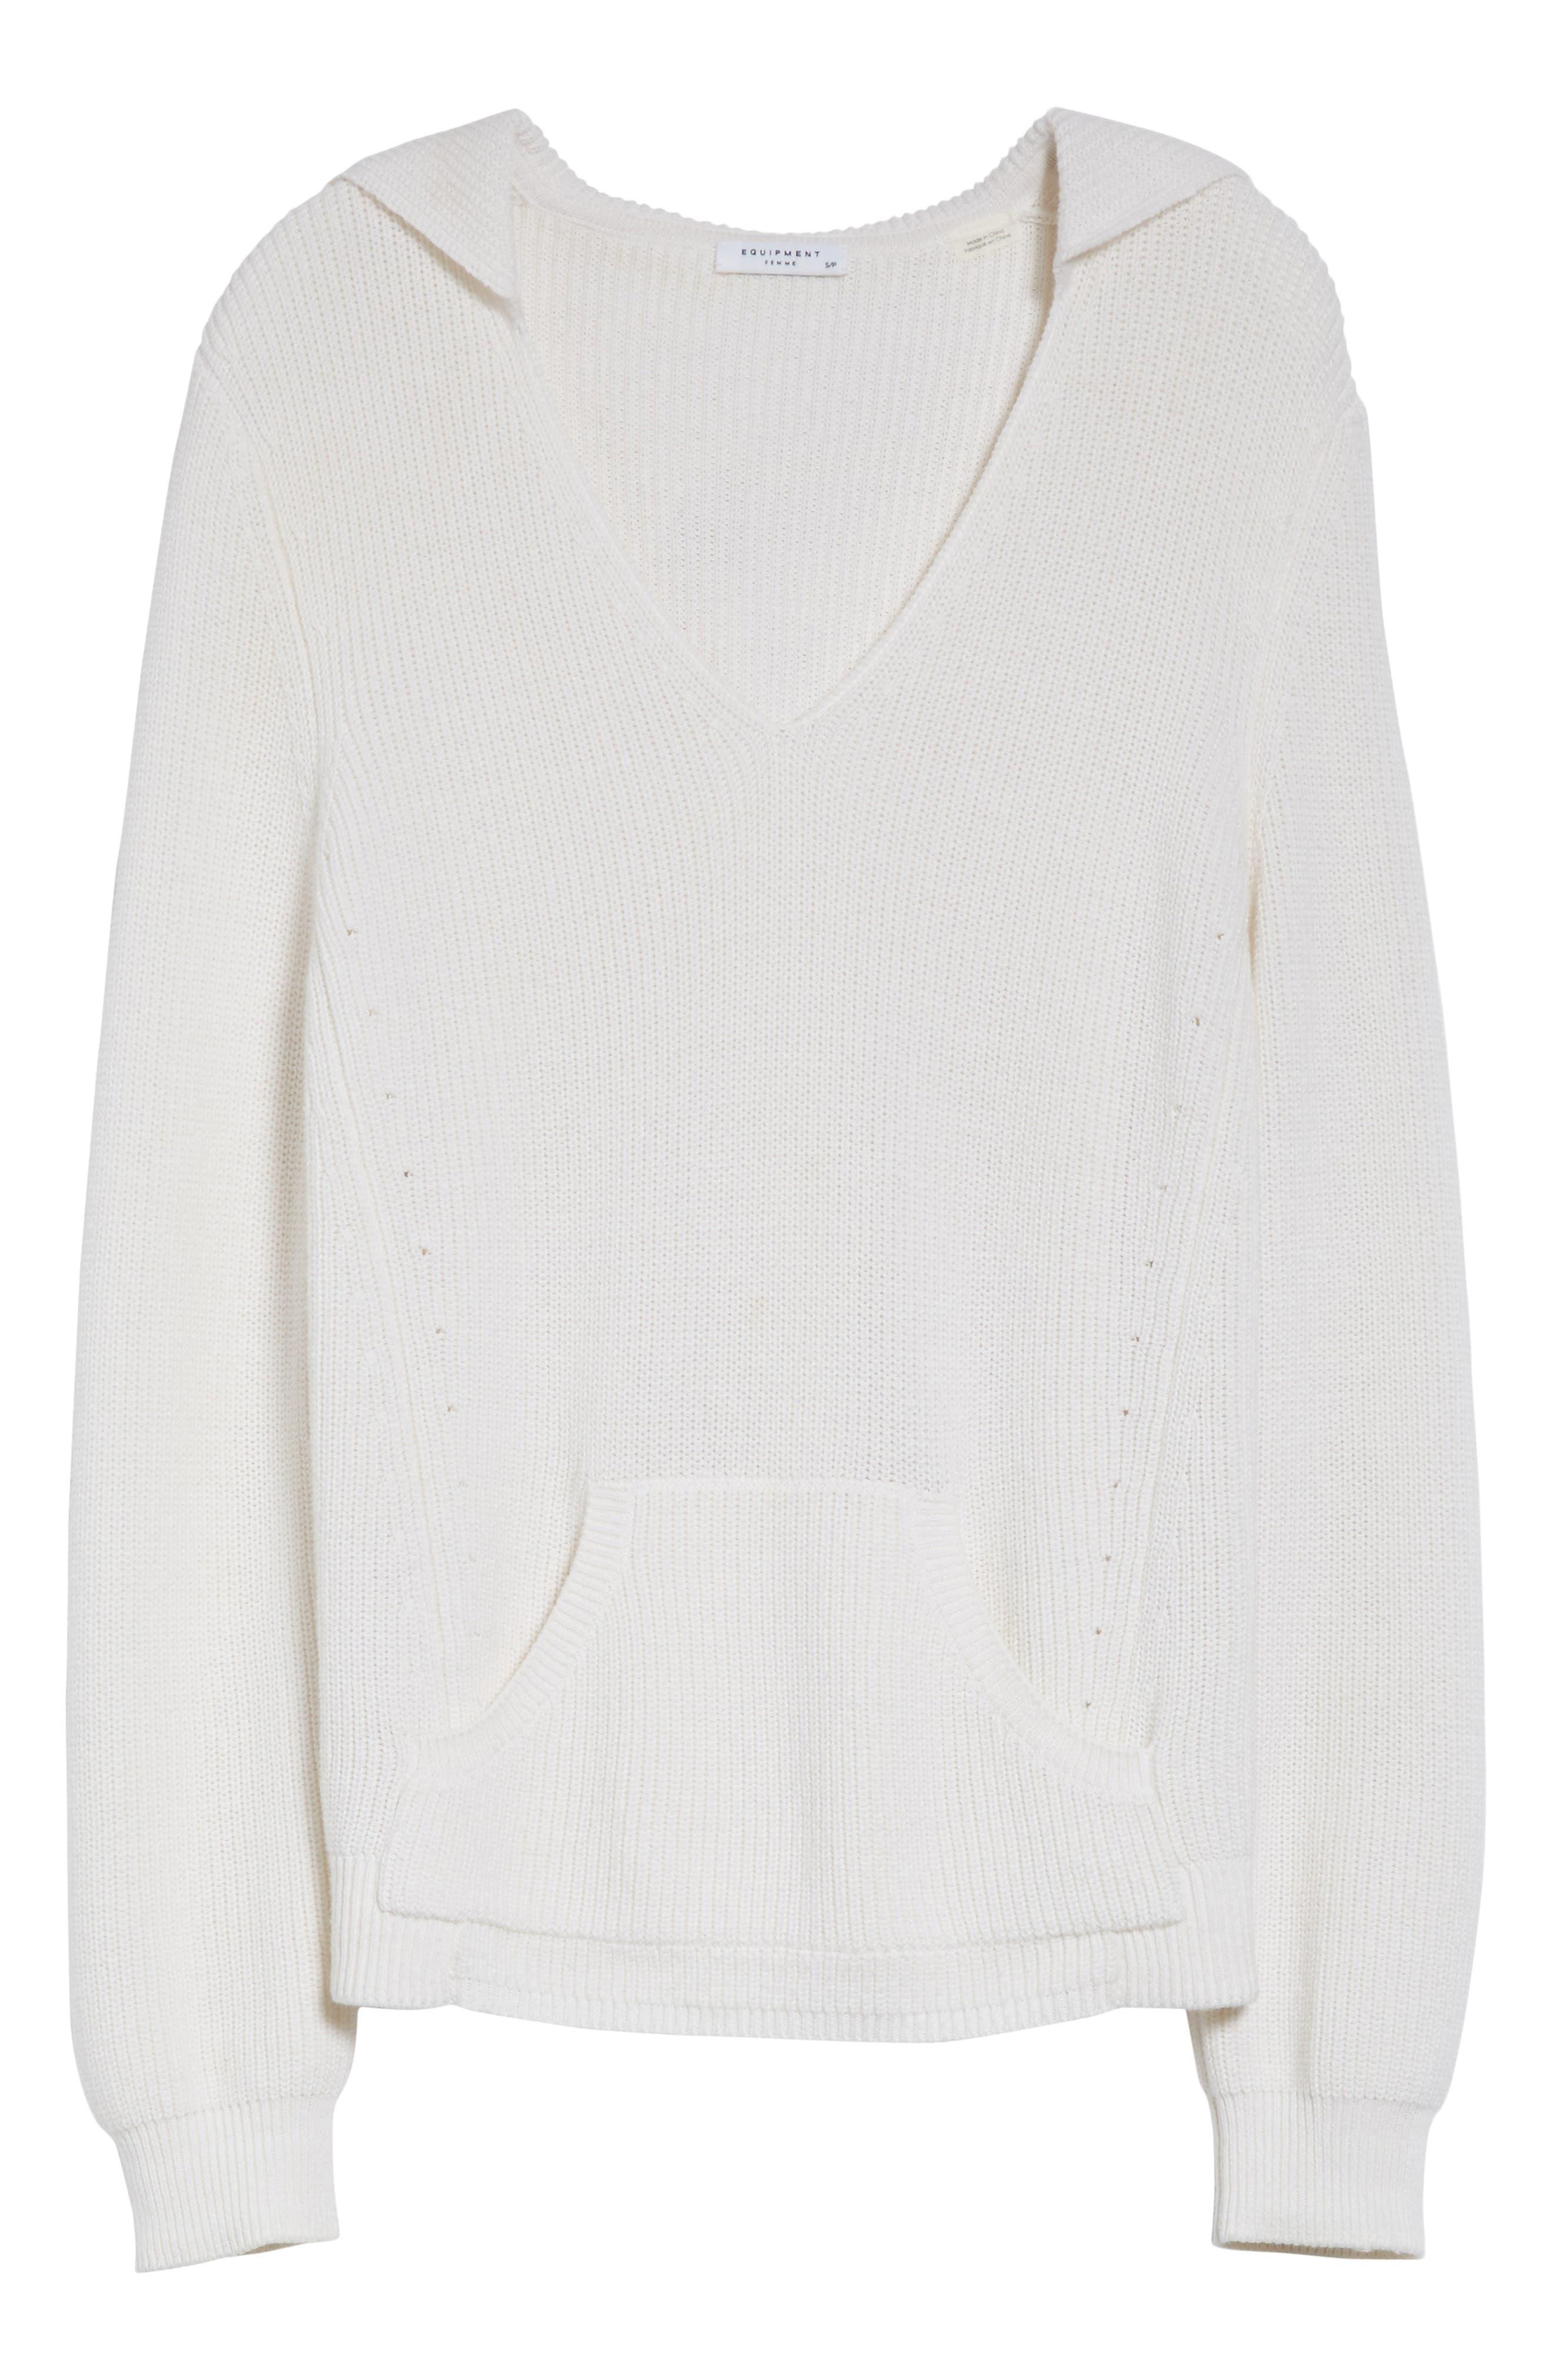 Octavia Hooded Sweater,                             Alternate thumbnail 6, color,